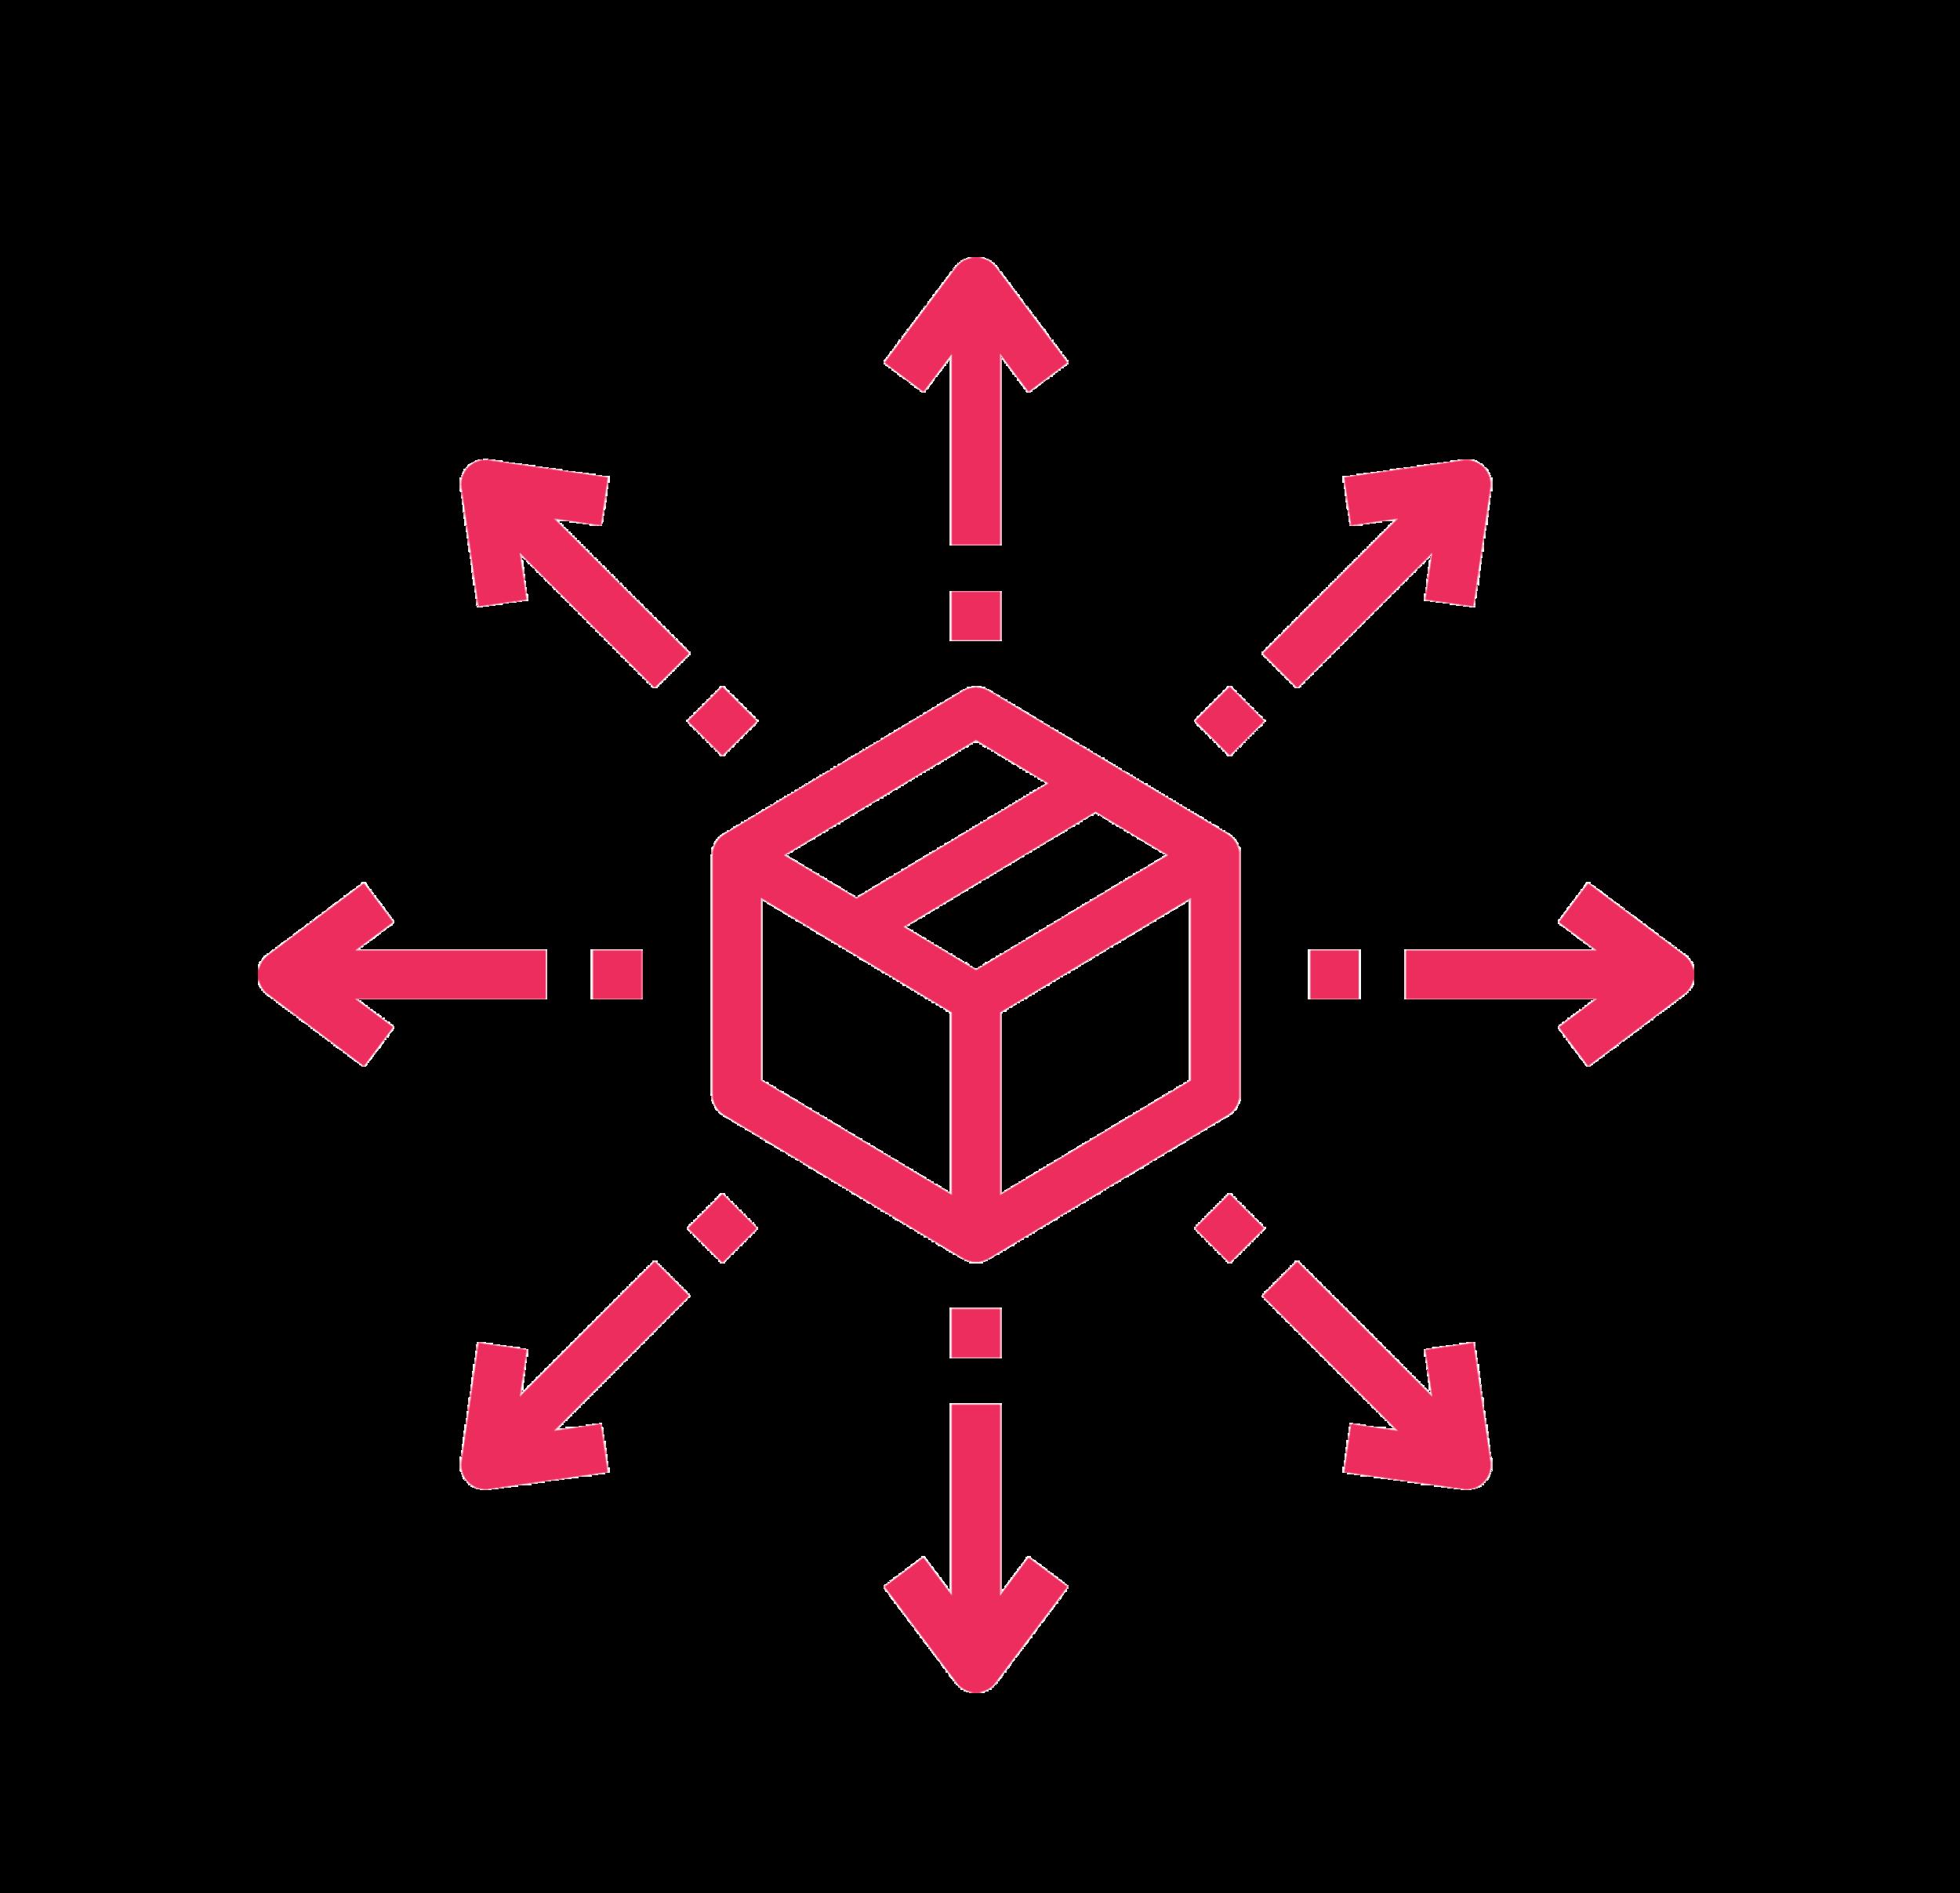 002-product_transparent.png